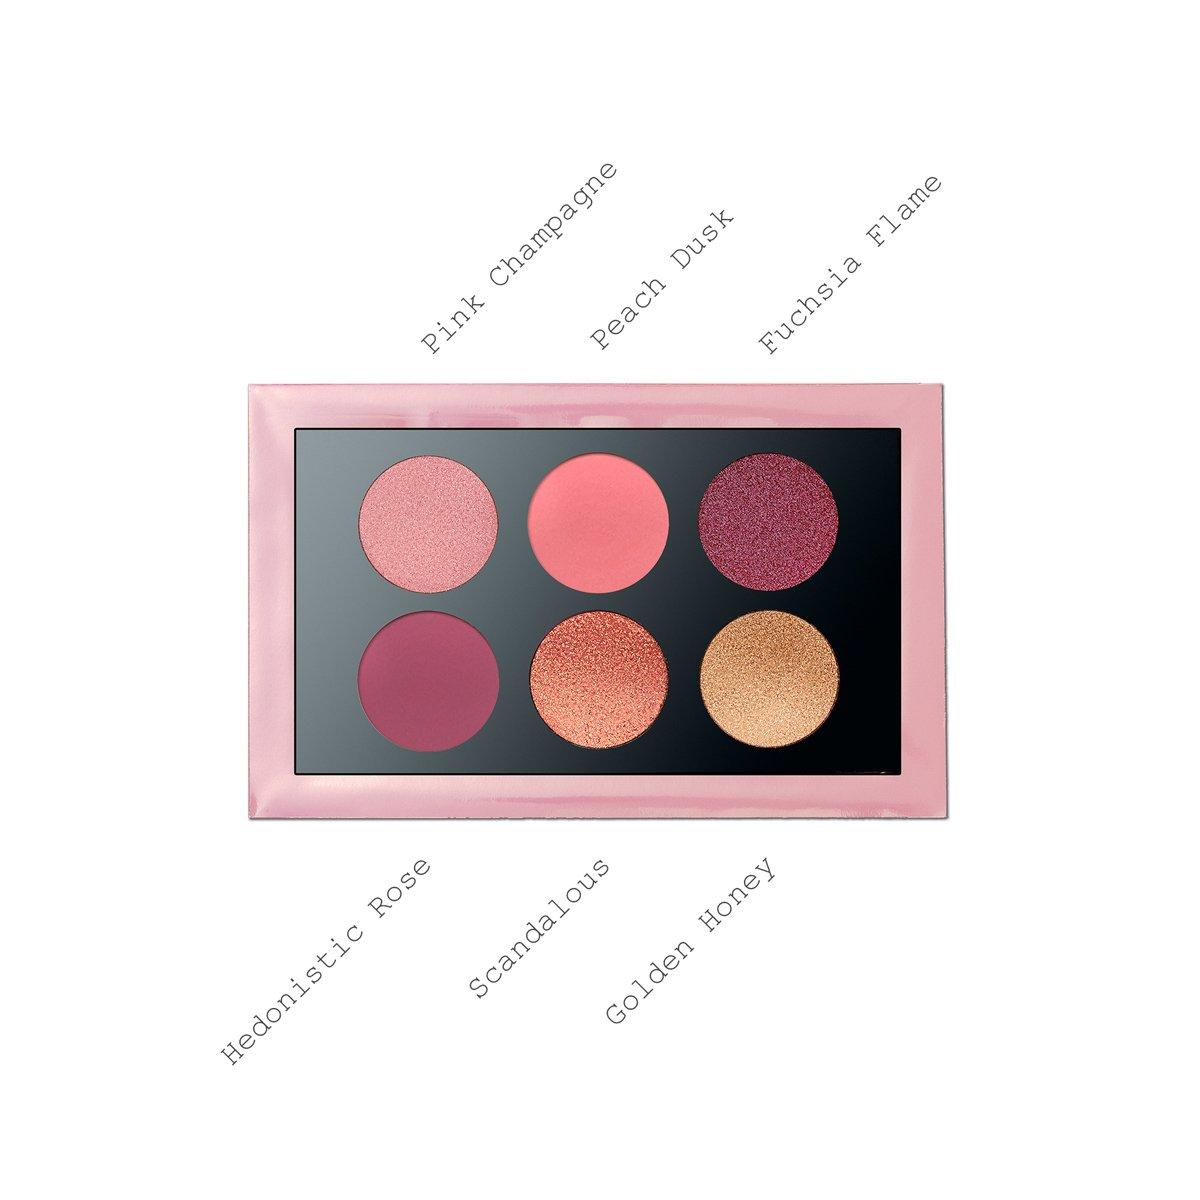 Pat McGrath Rose Decadence Eye Shadow Palette